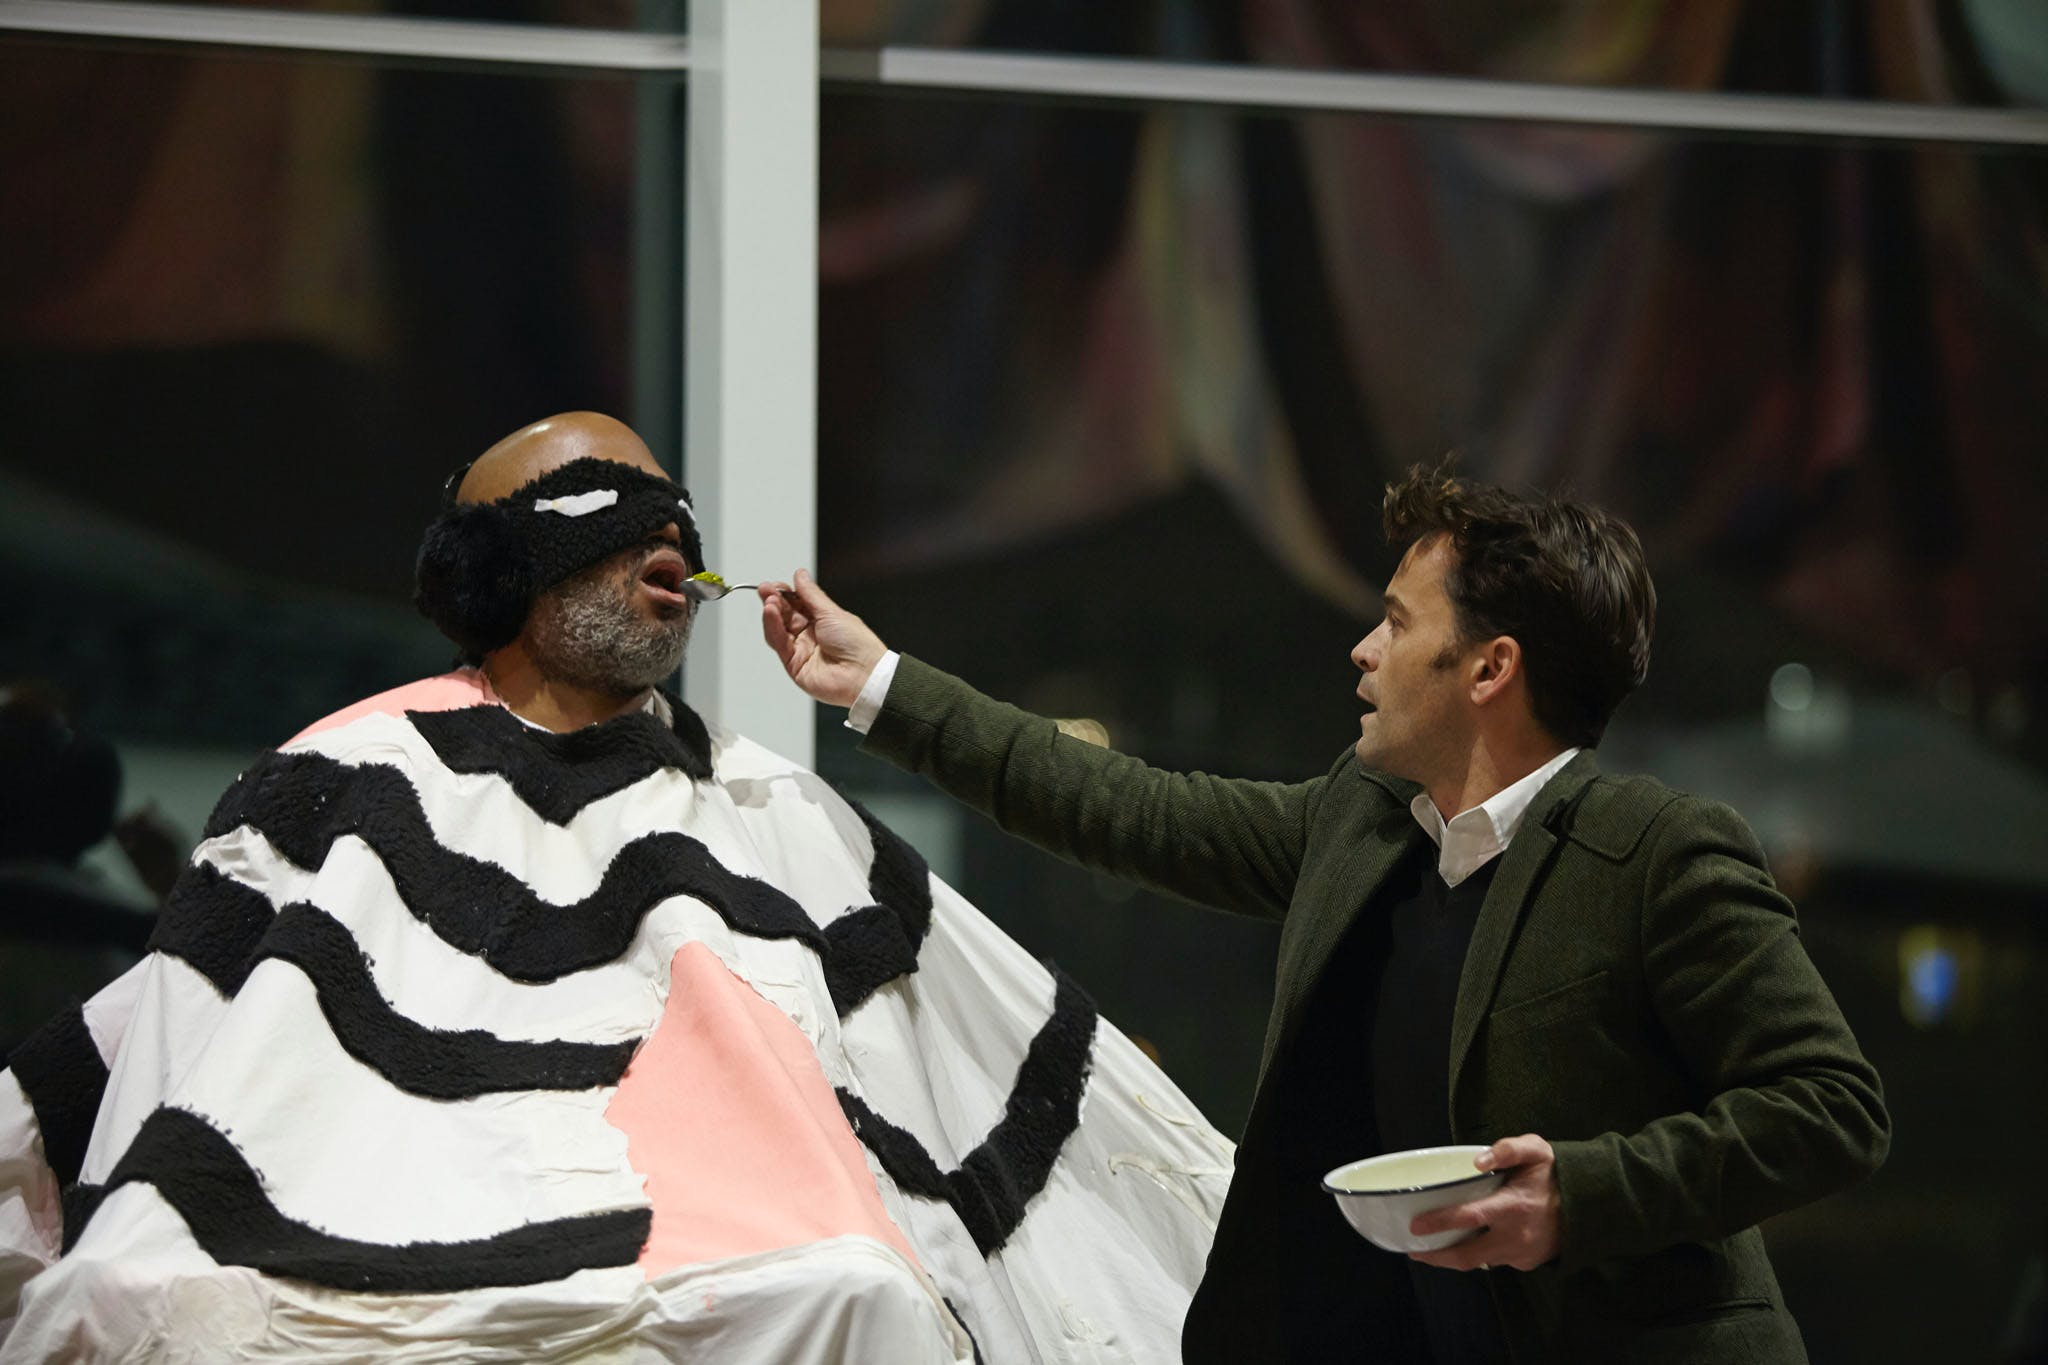 Trenton Doyle Hancock, Devotion, 2013; part of the exhibition Radical Presence: Black Performance in Contemporary Art, 2014